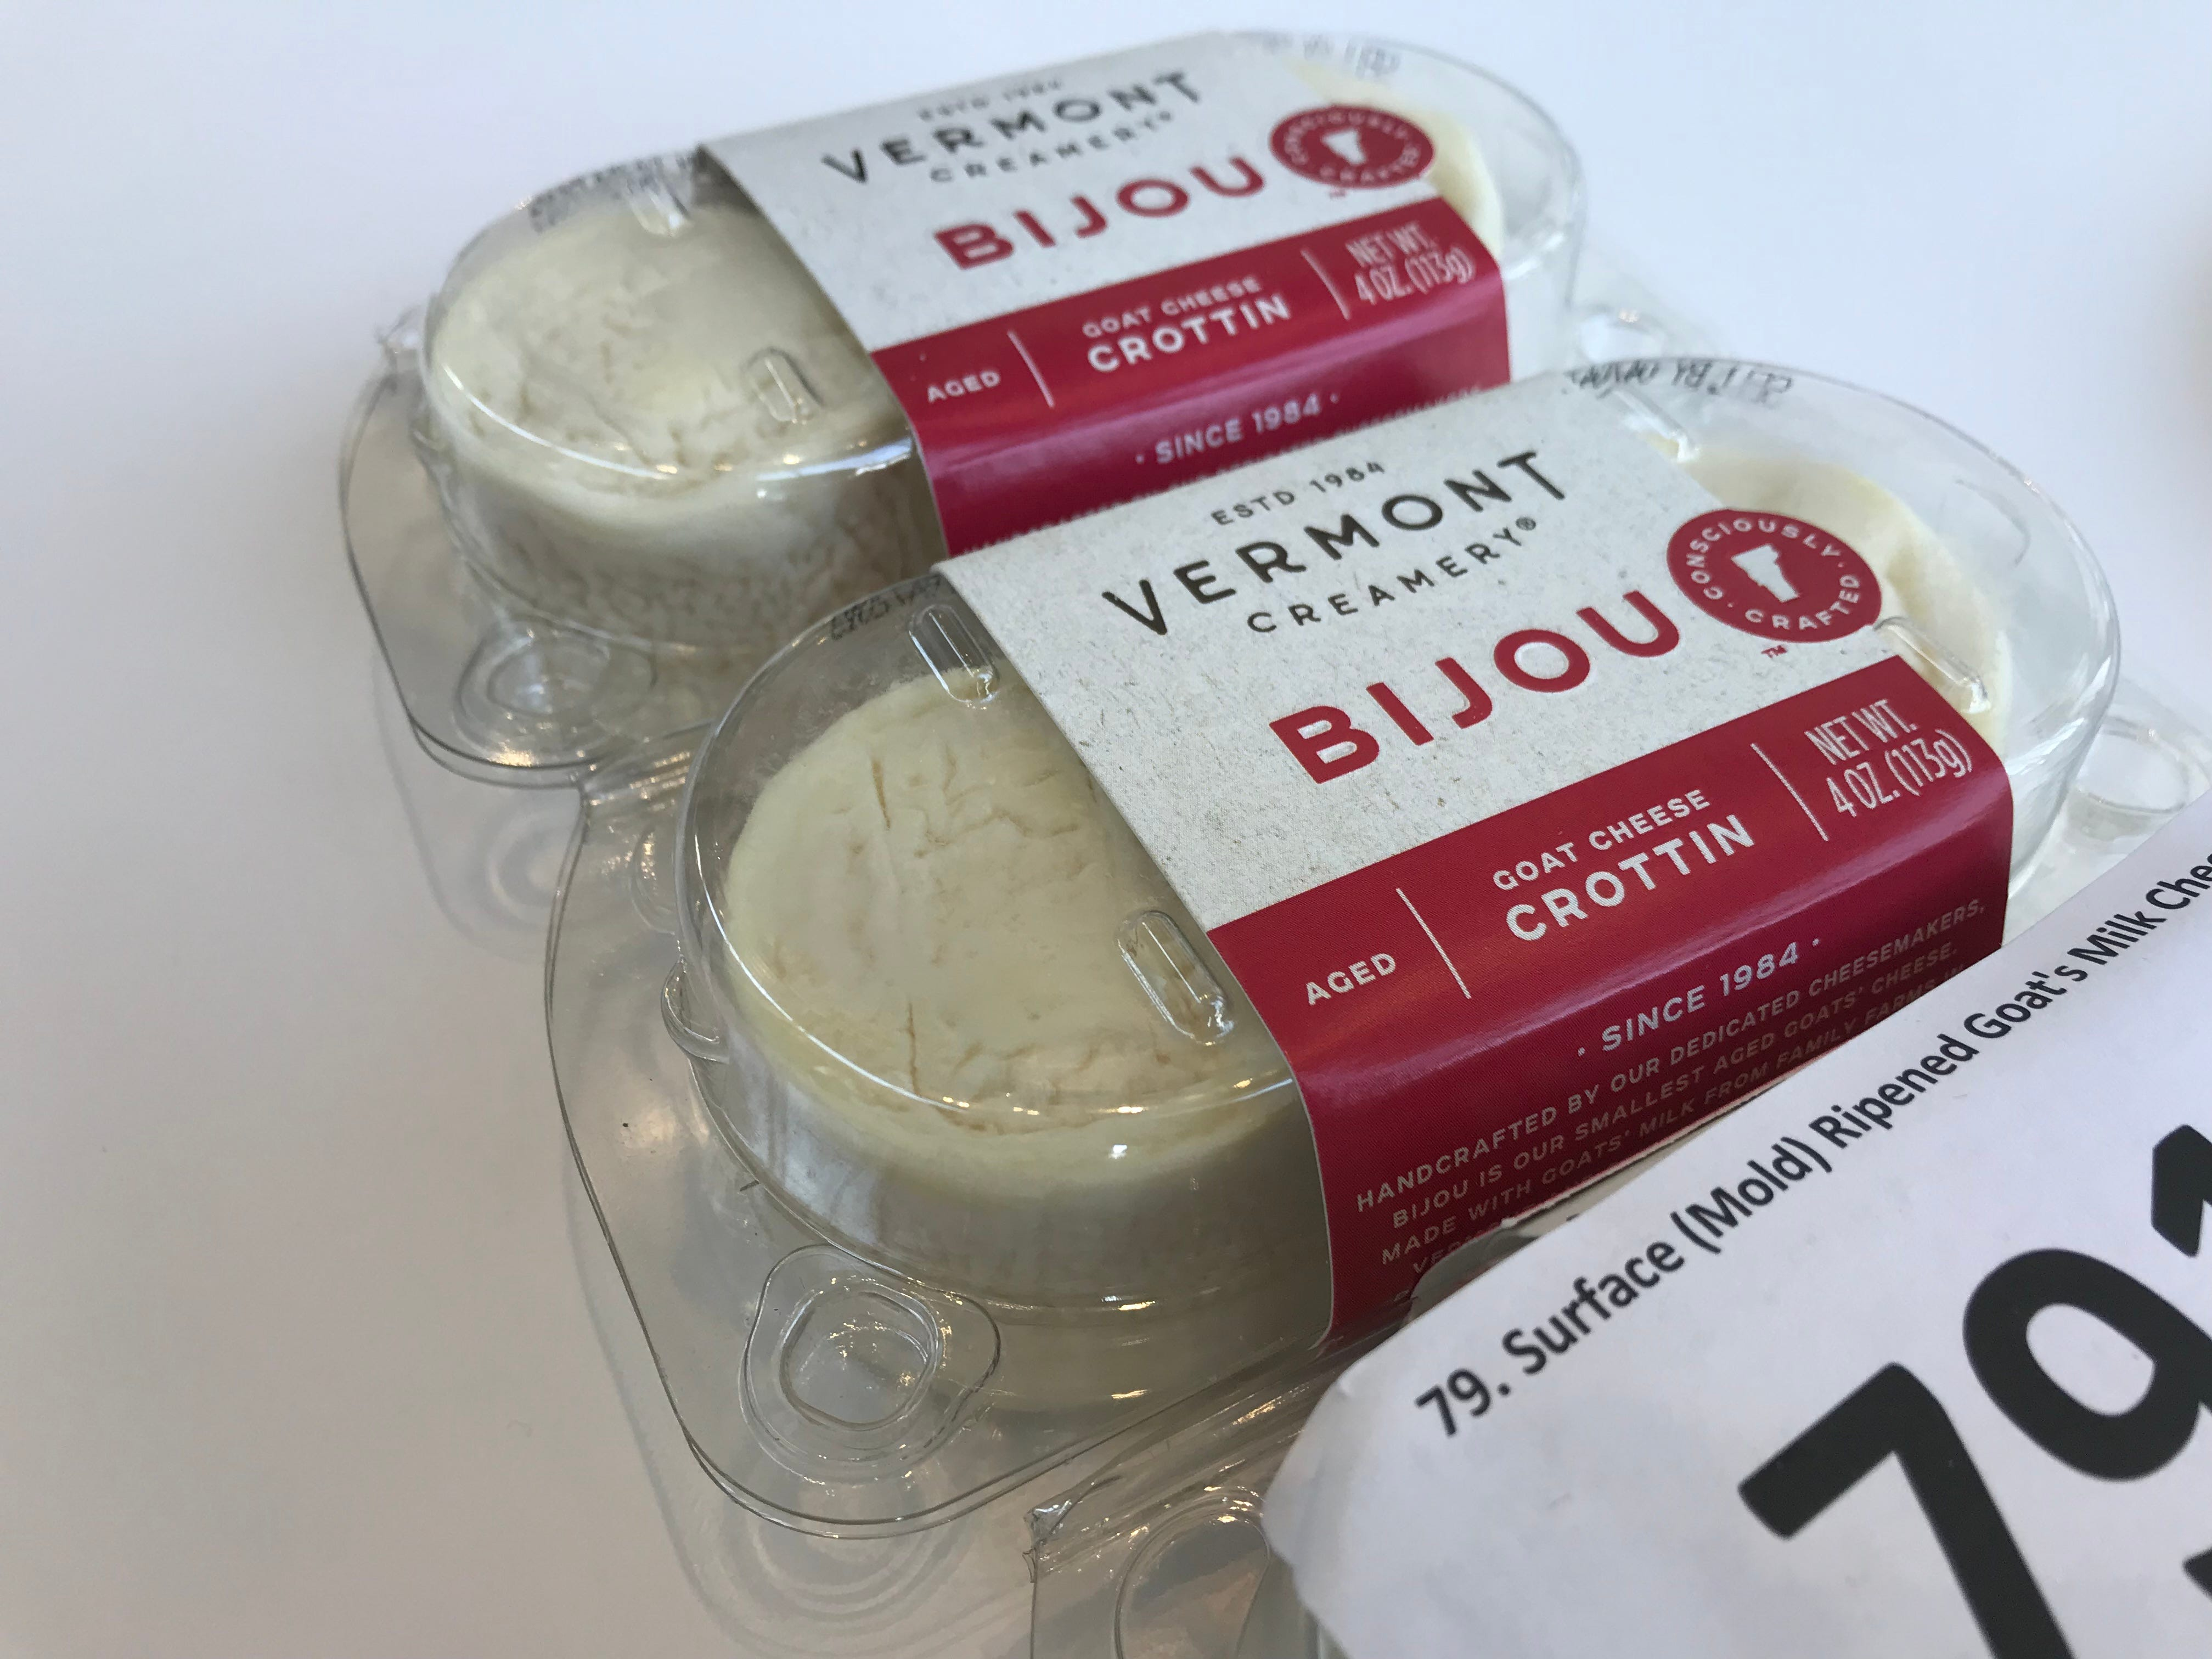 Bijou, Vermont Creamery, Vermont is a 2019 U.S. Championship Cheese Contest finalist.